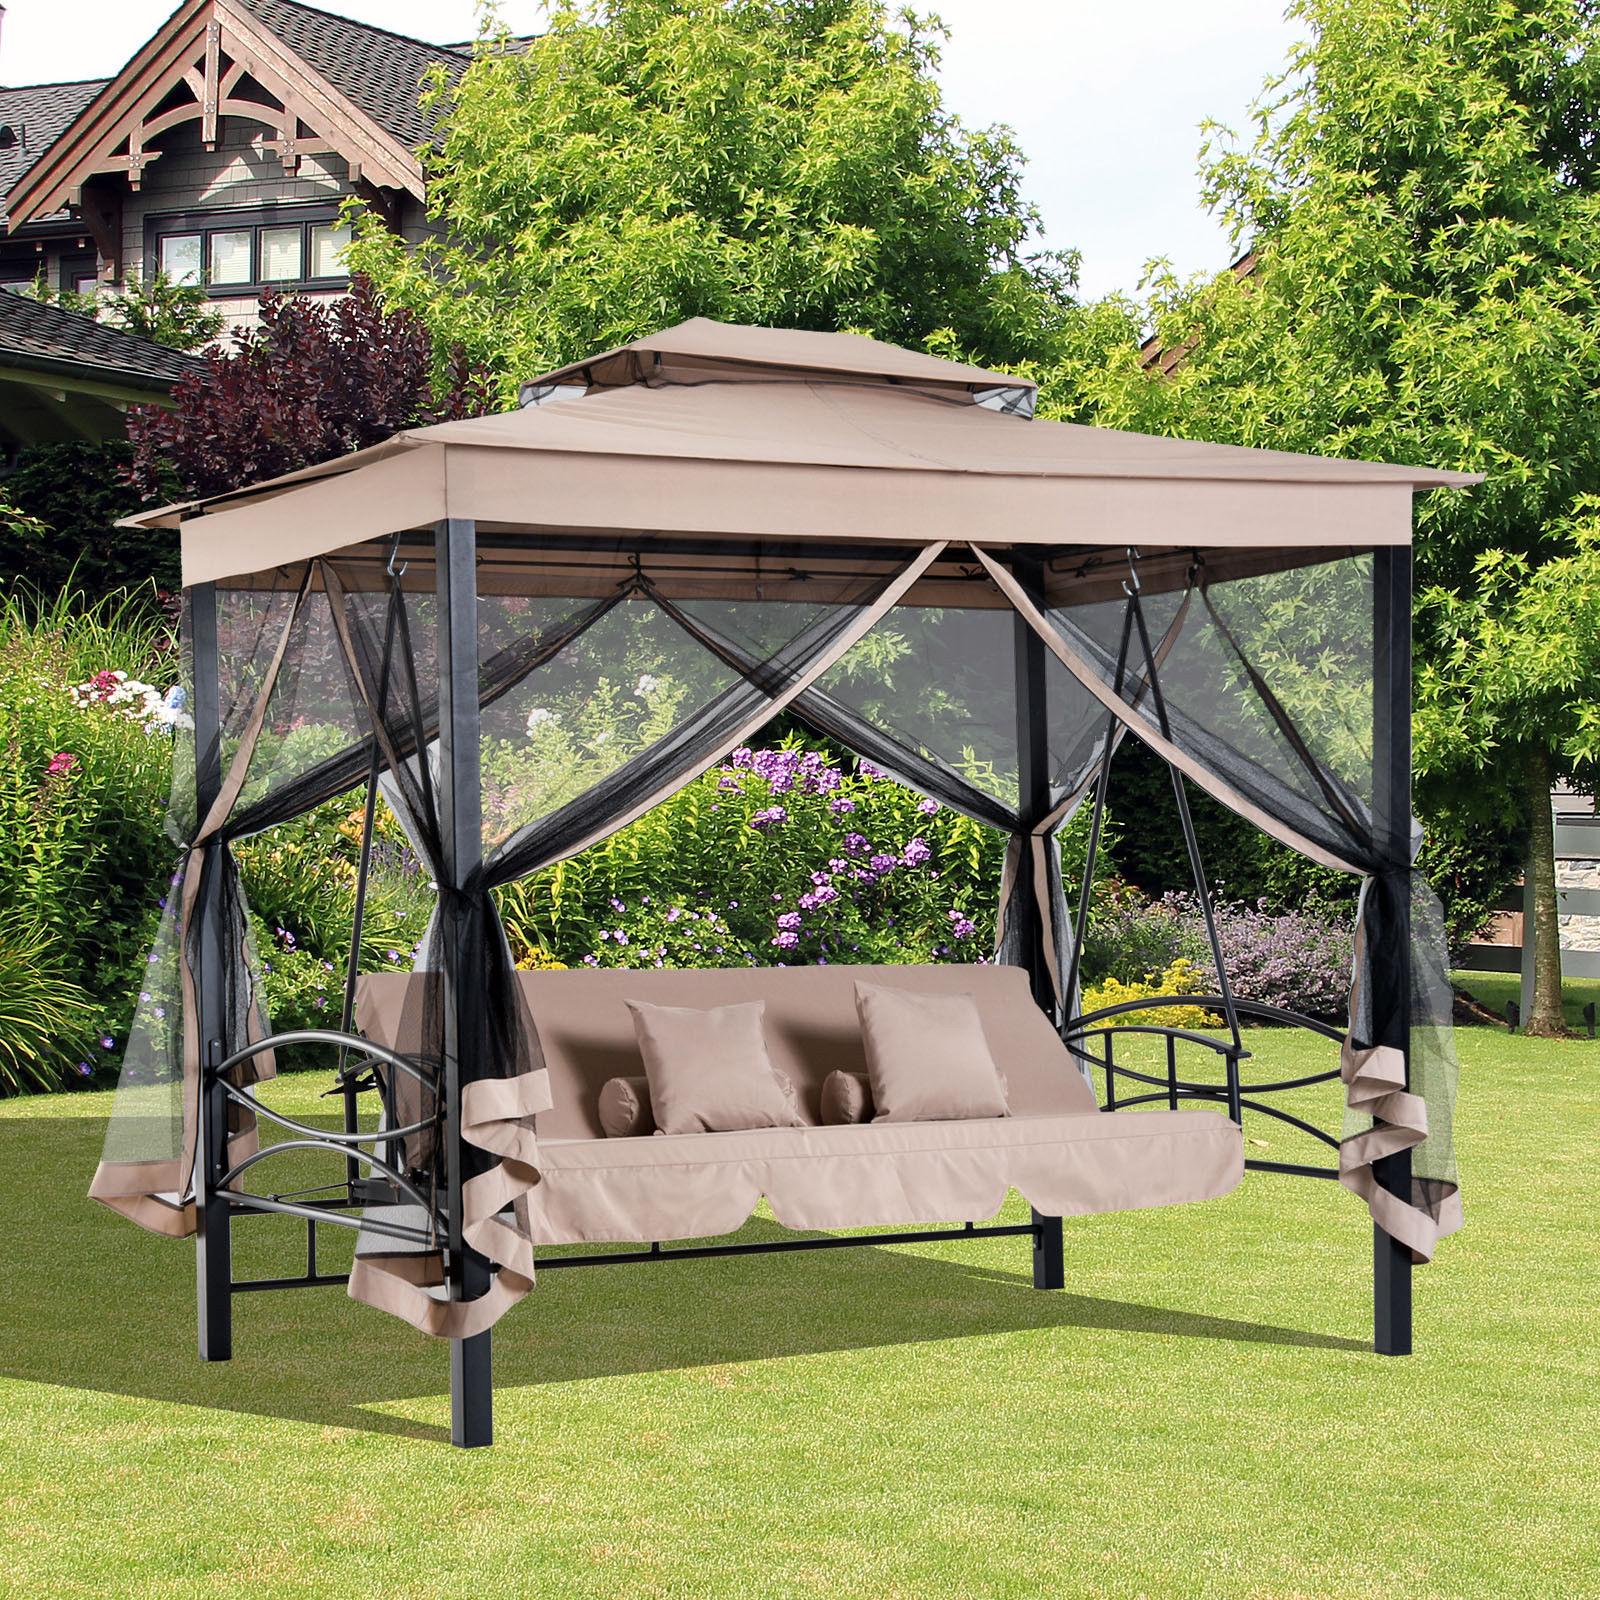 2 In 1 Tree Seater Swing Hammock Gazebo Day Bed With 3 Seat Pergola Swings (View 11 of 25)